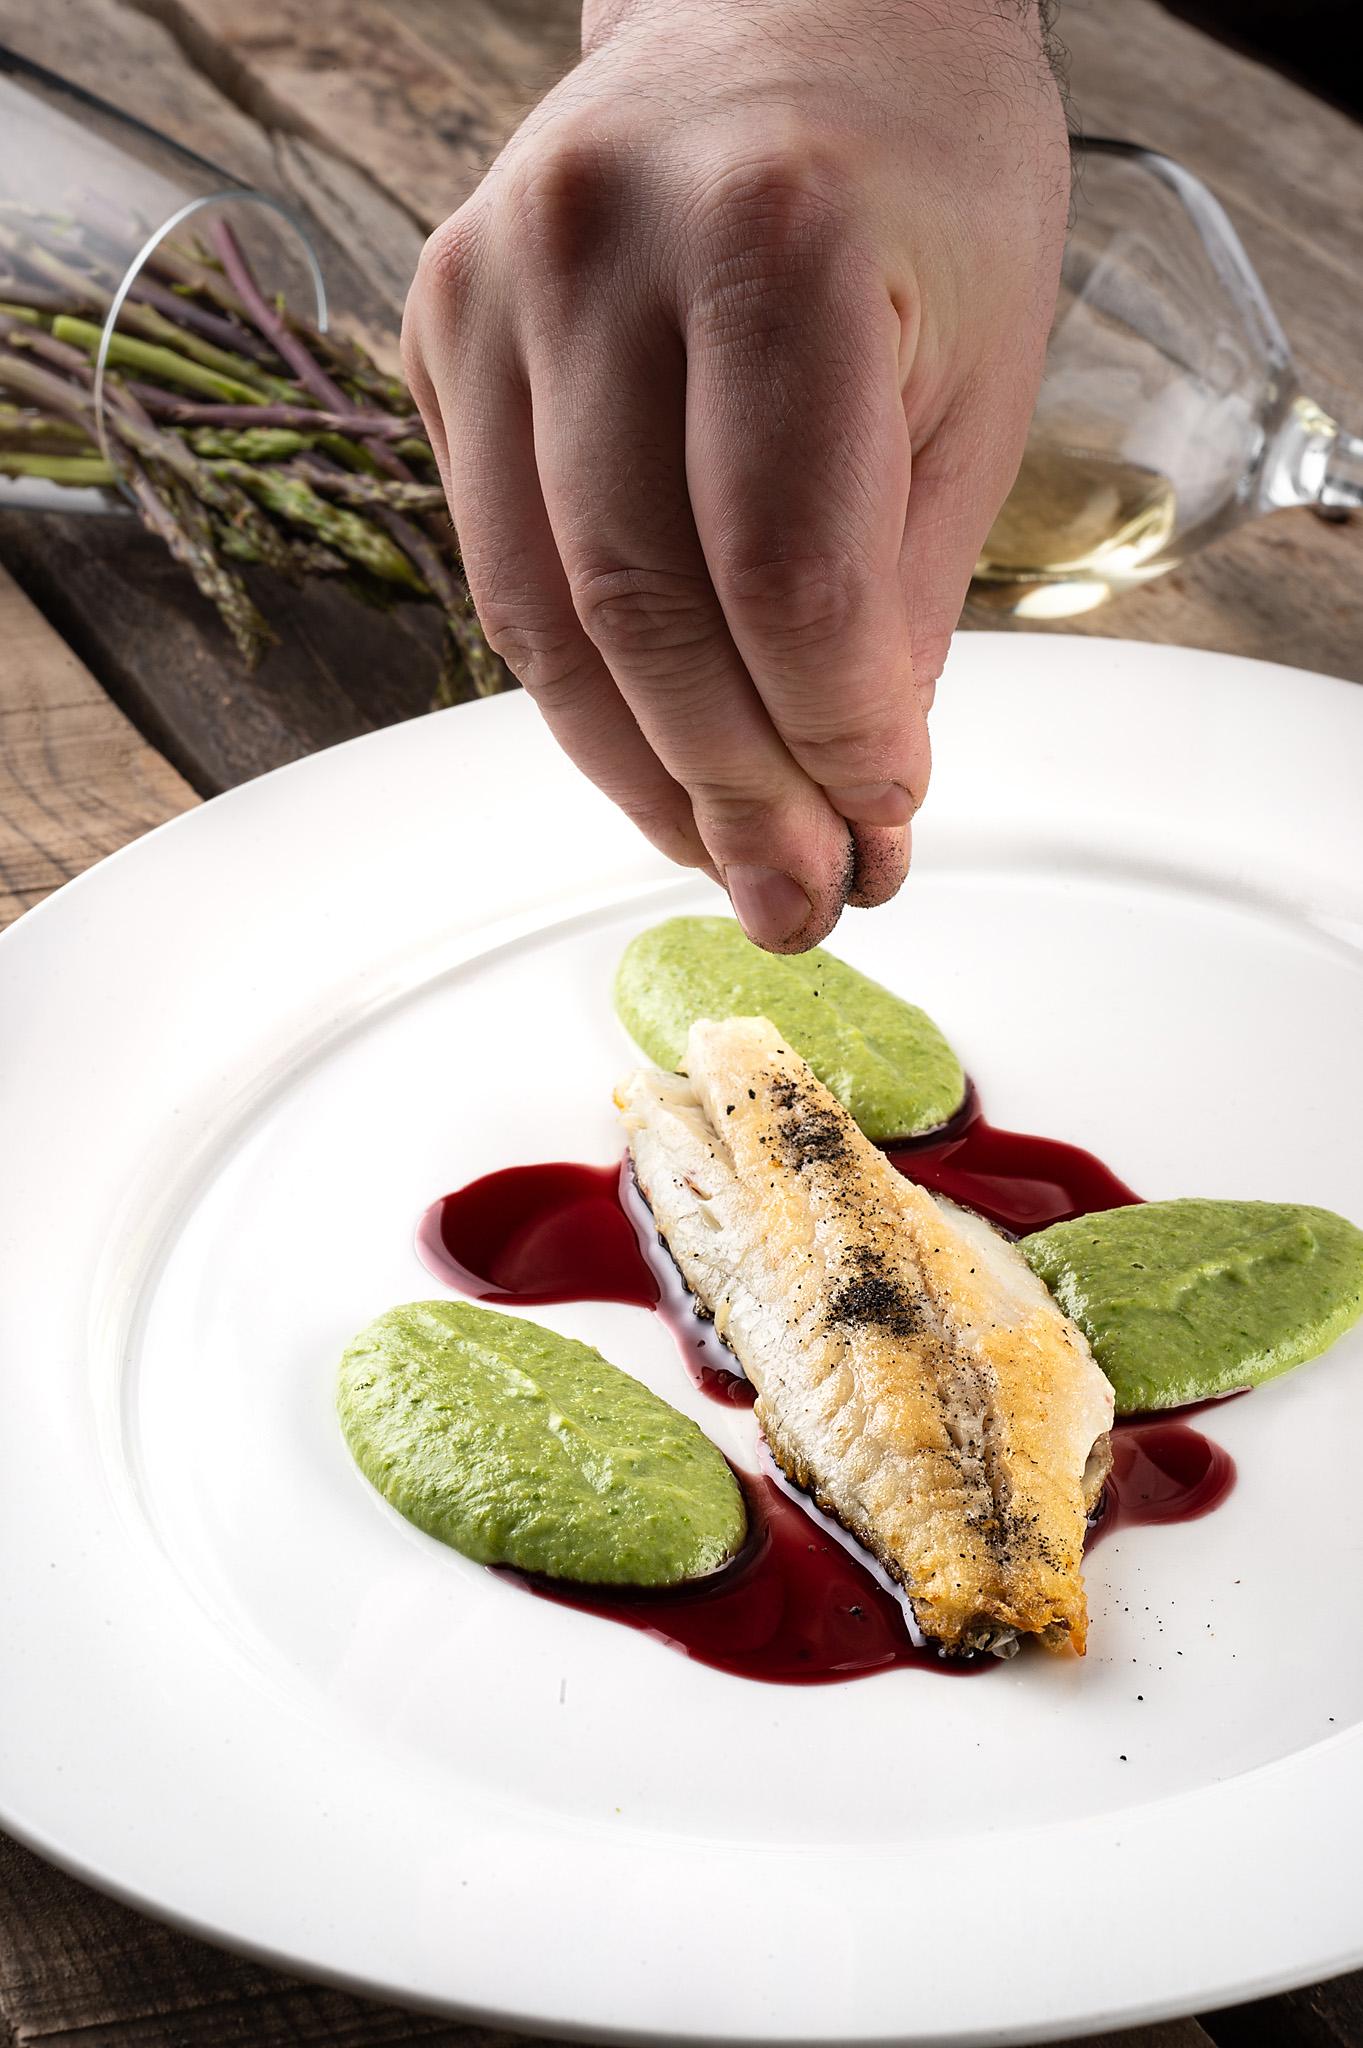 hren | plethora of creativity // Restaurant Rivica food photography